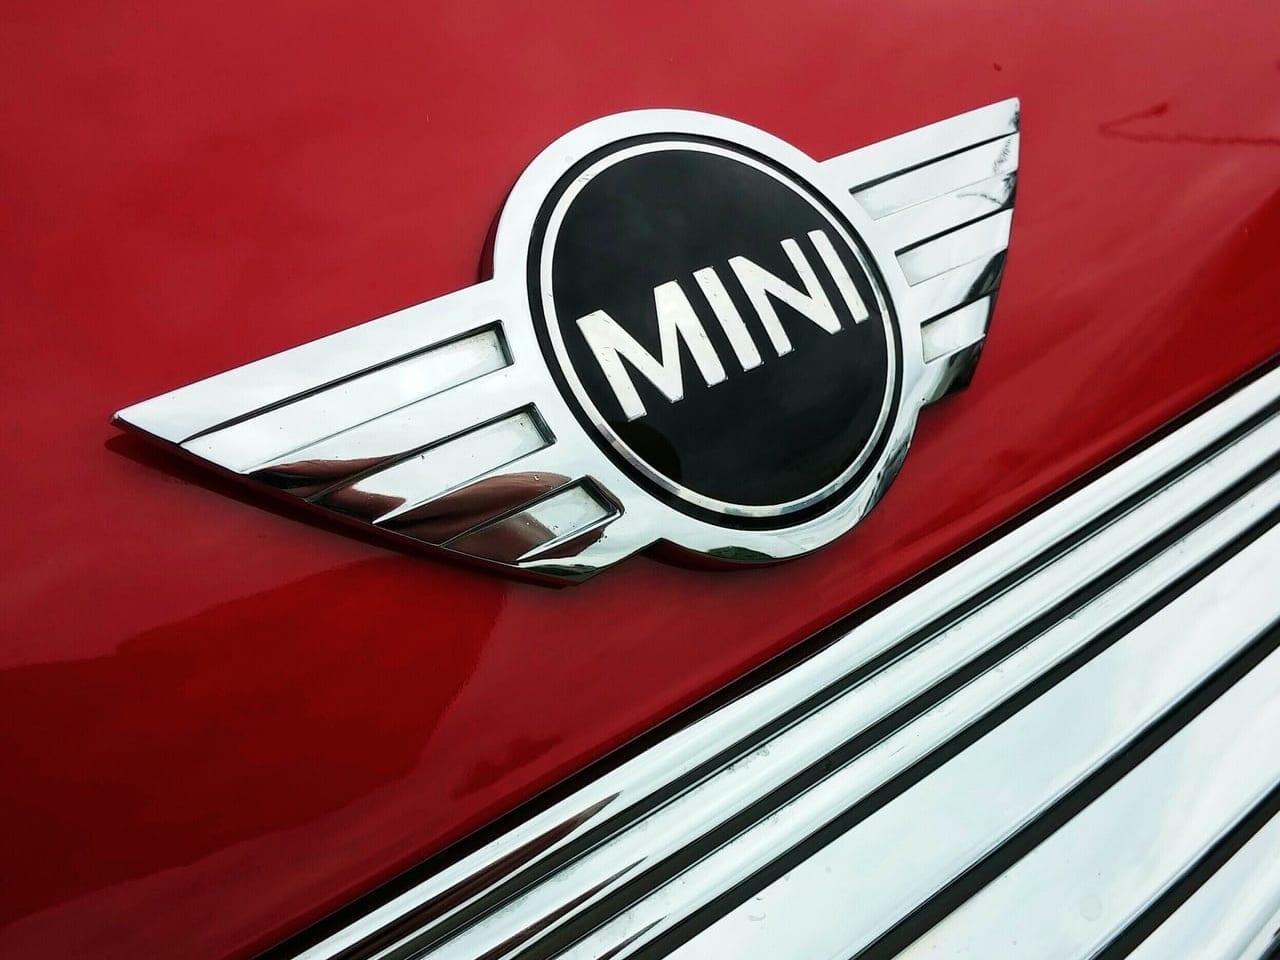 MINI正規ディーラー「MINI 流山おおたかの森」が1月18日をもって閉店しました。